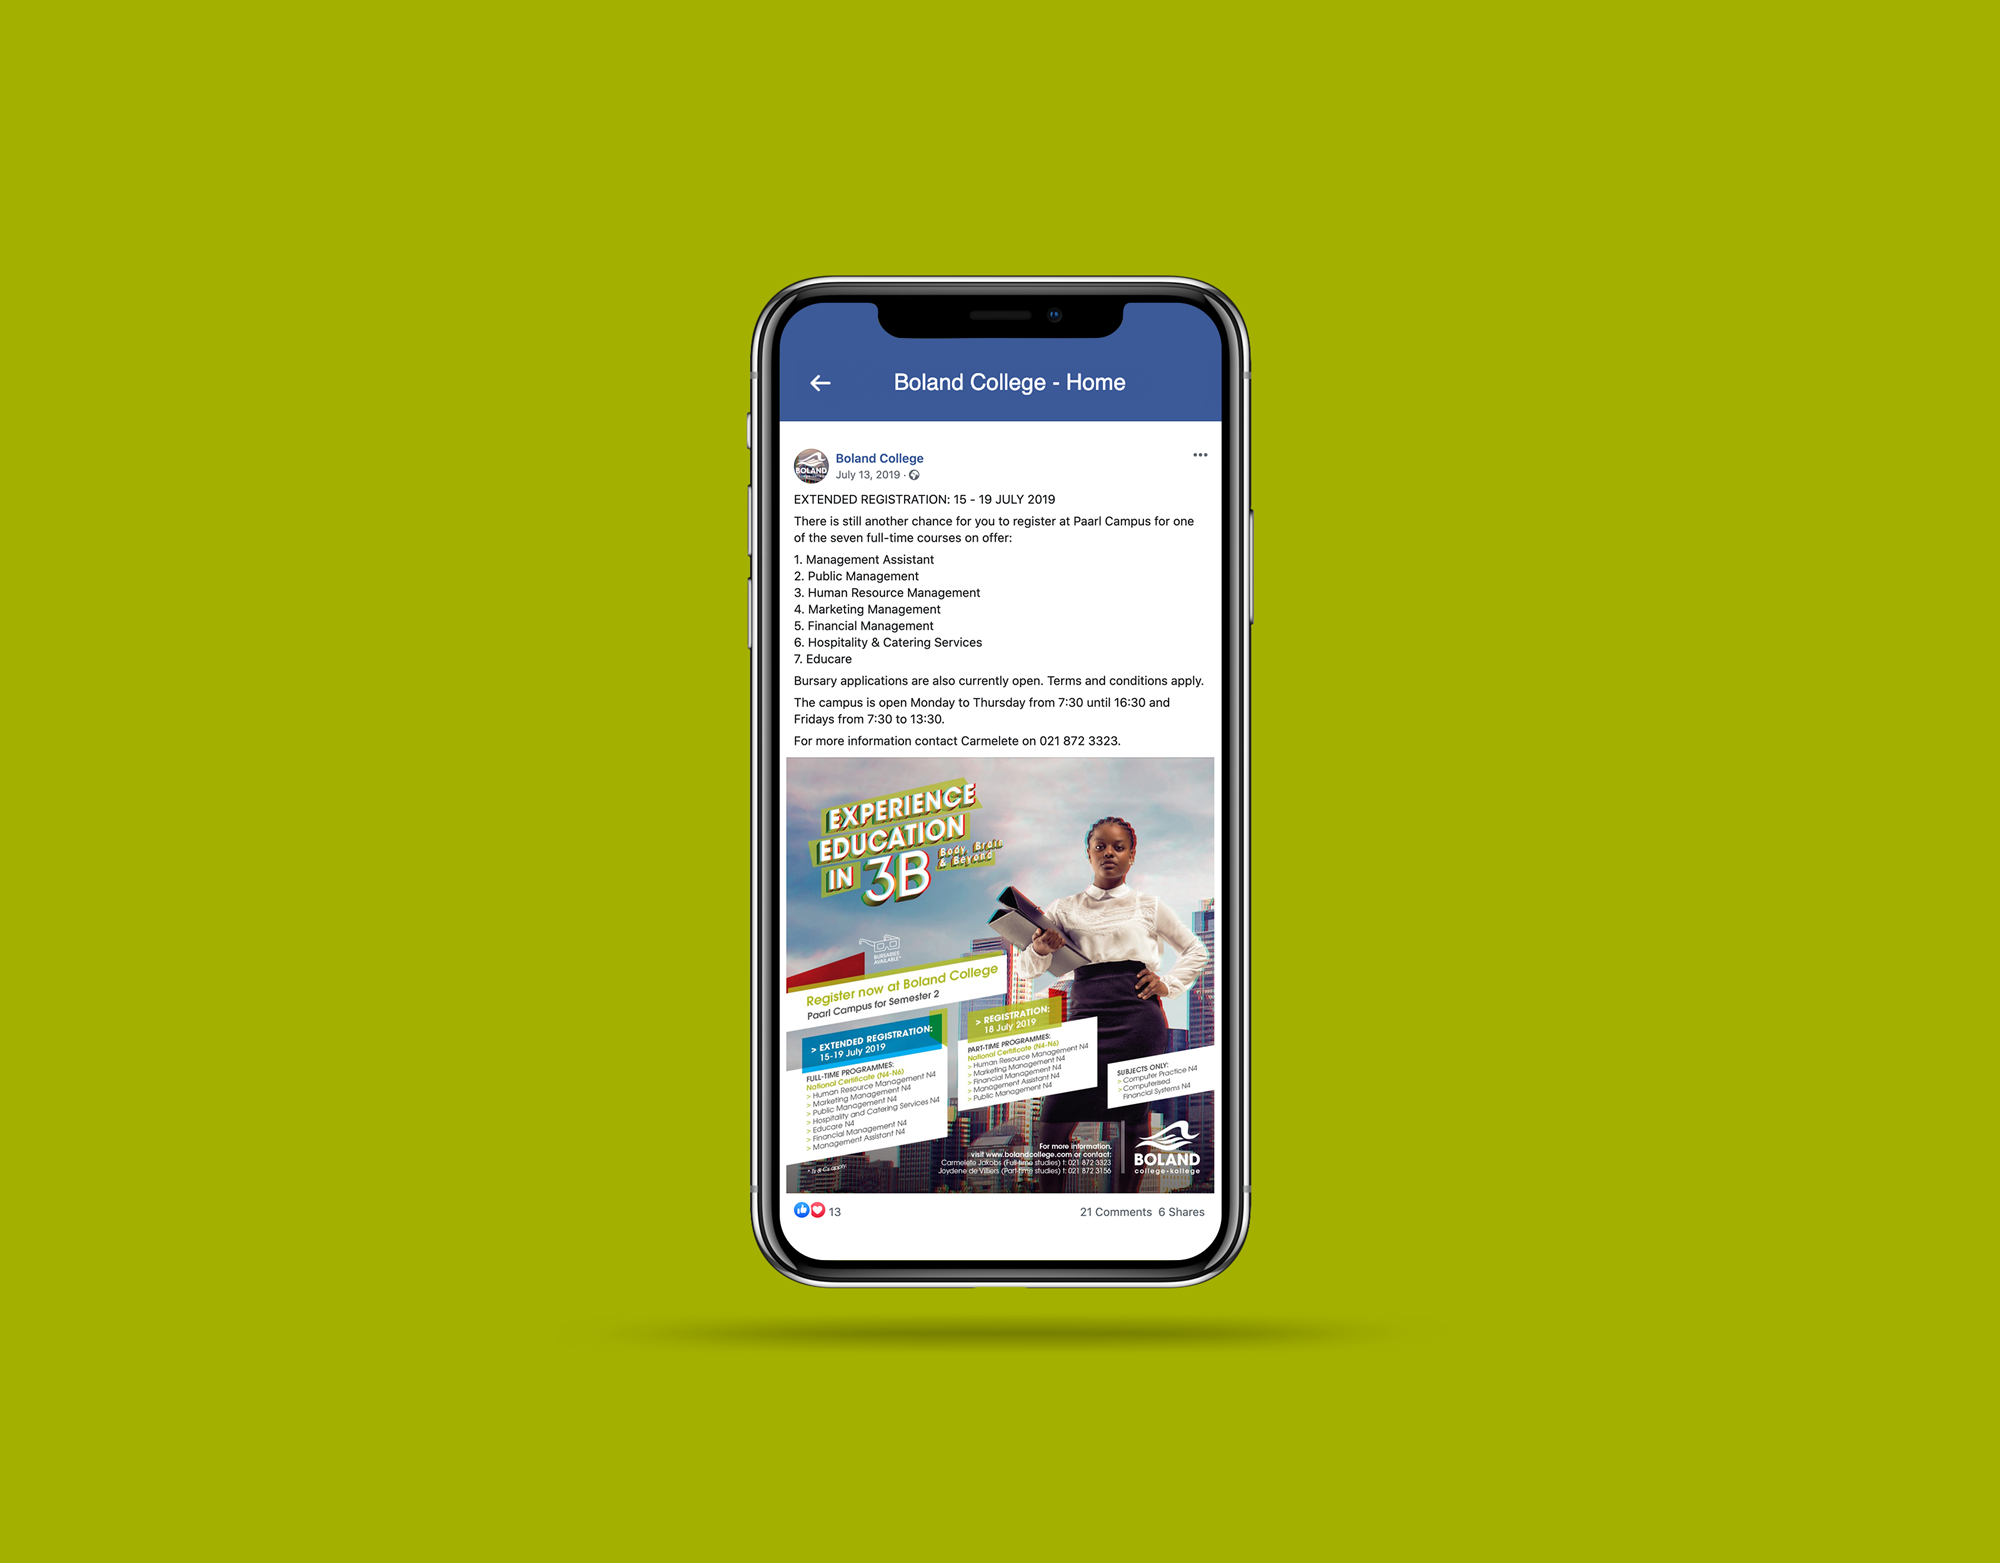 Social Media – Boland College